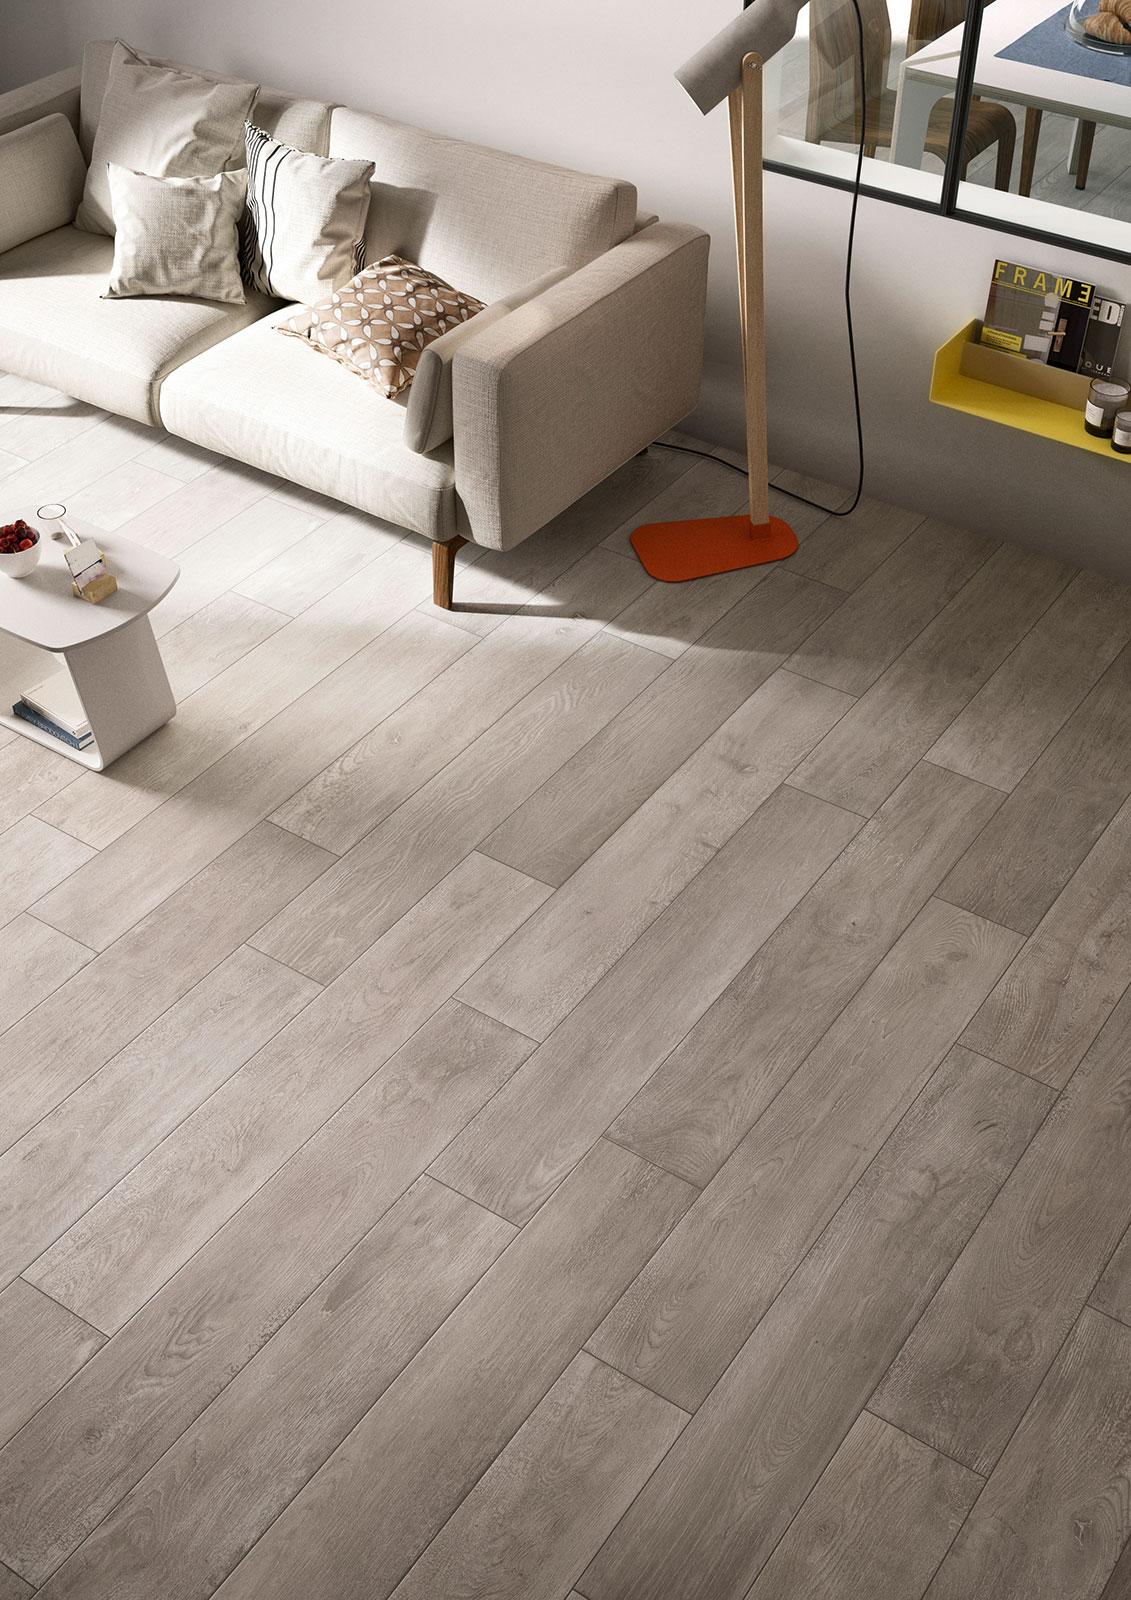 Carrelage salon inspiration d co marazzi for Modern hardwood flooring ideas